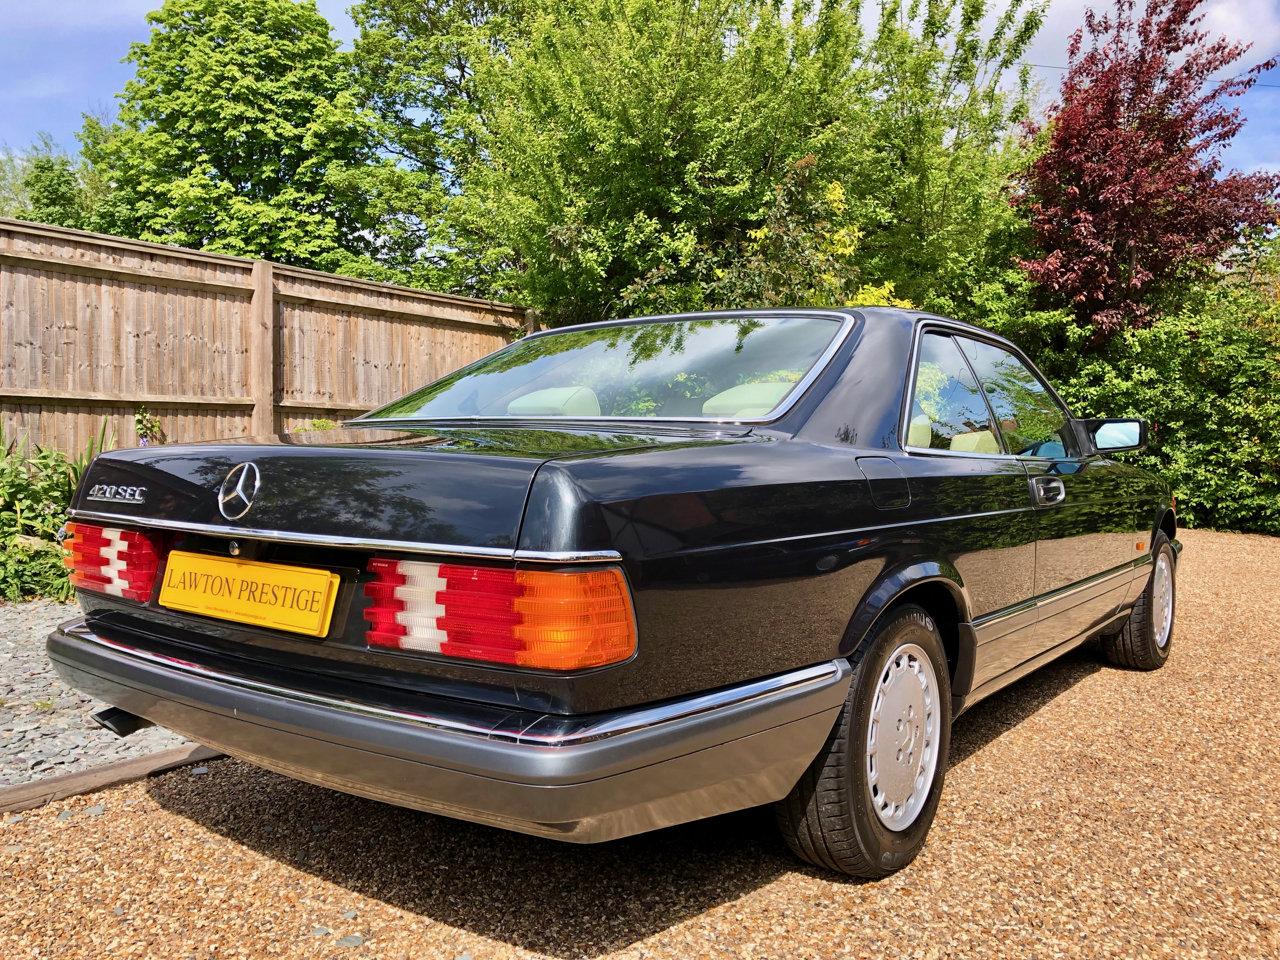 1992/J - Mercedes 420SEC C126 *SOLD* 560SEC 500 SEC For Sale (picture 3 of 6)